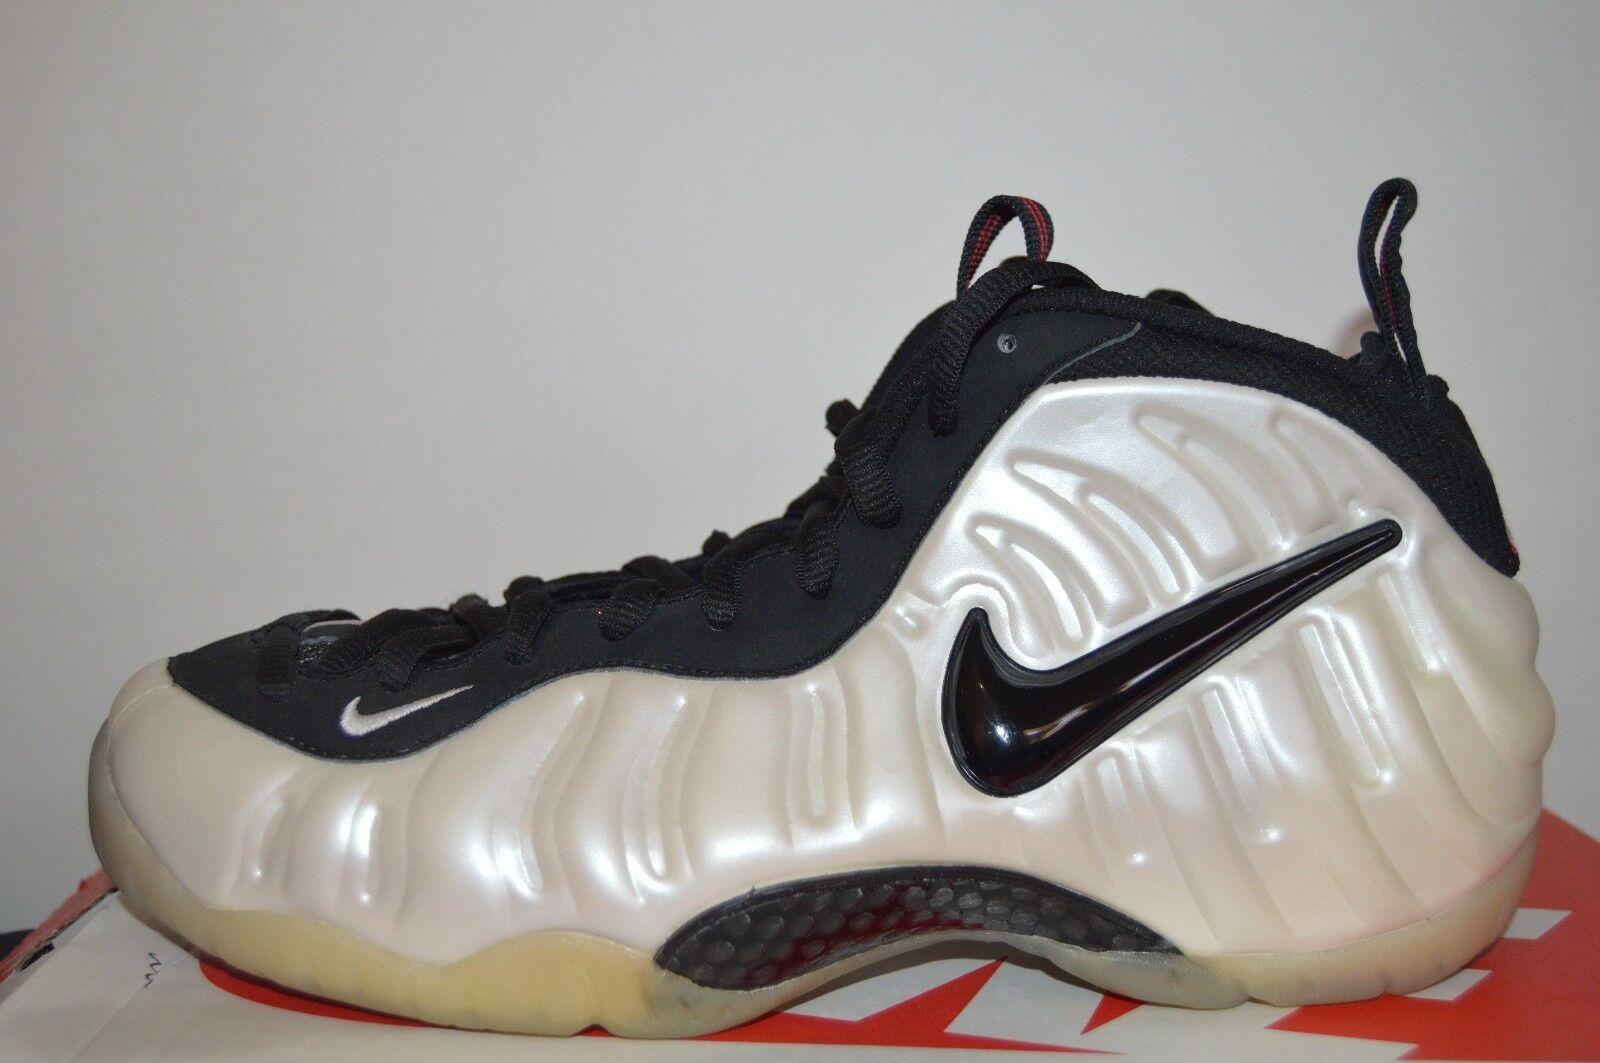 Nike Air Foamposite Pro Pearl White 2002 Men's Retro Basketball shoes Size 9.5